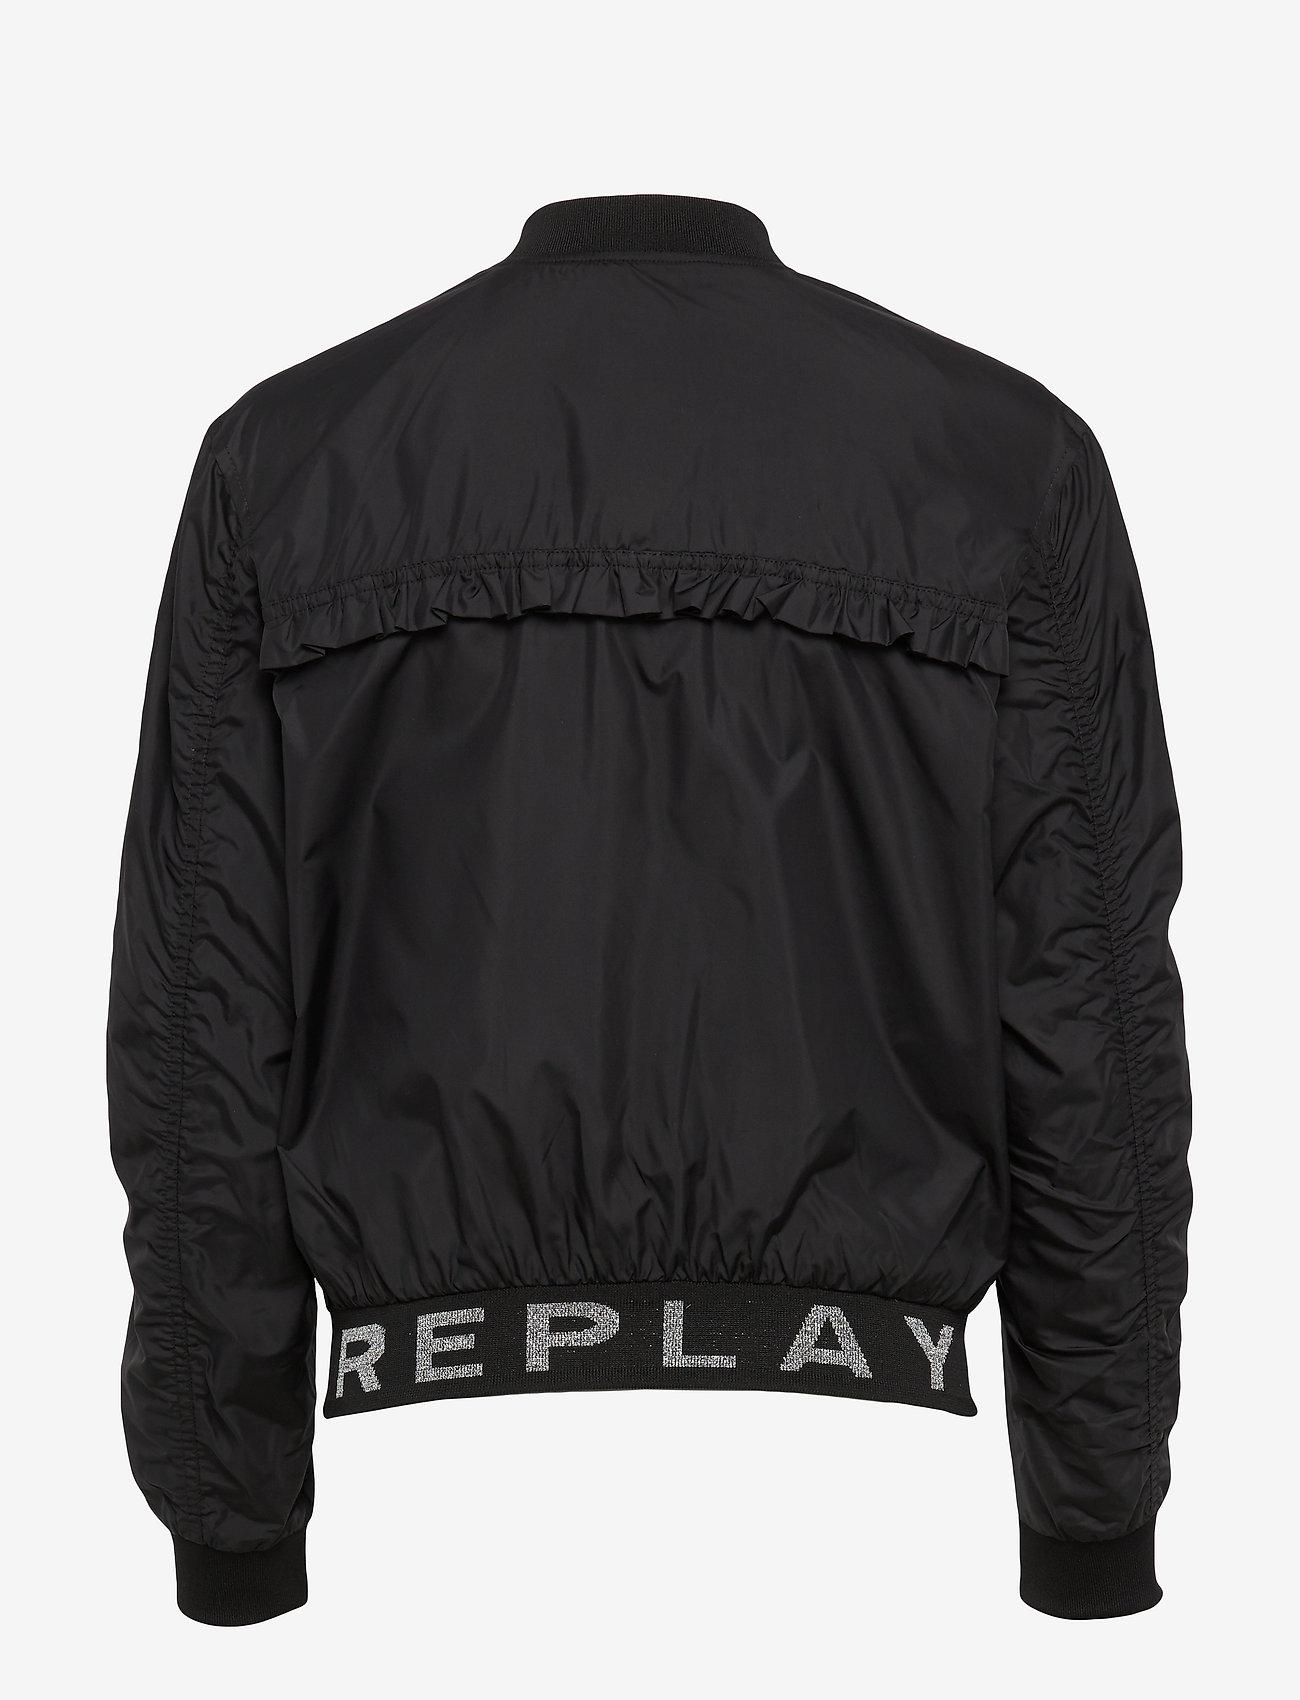 Replay - Jacket - bomber jakker - black - 1